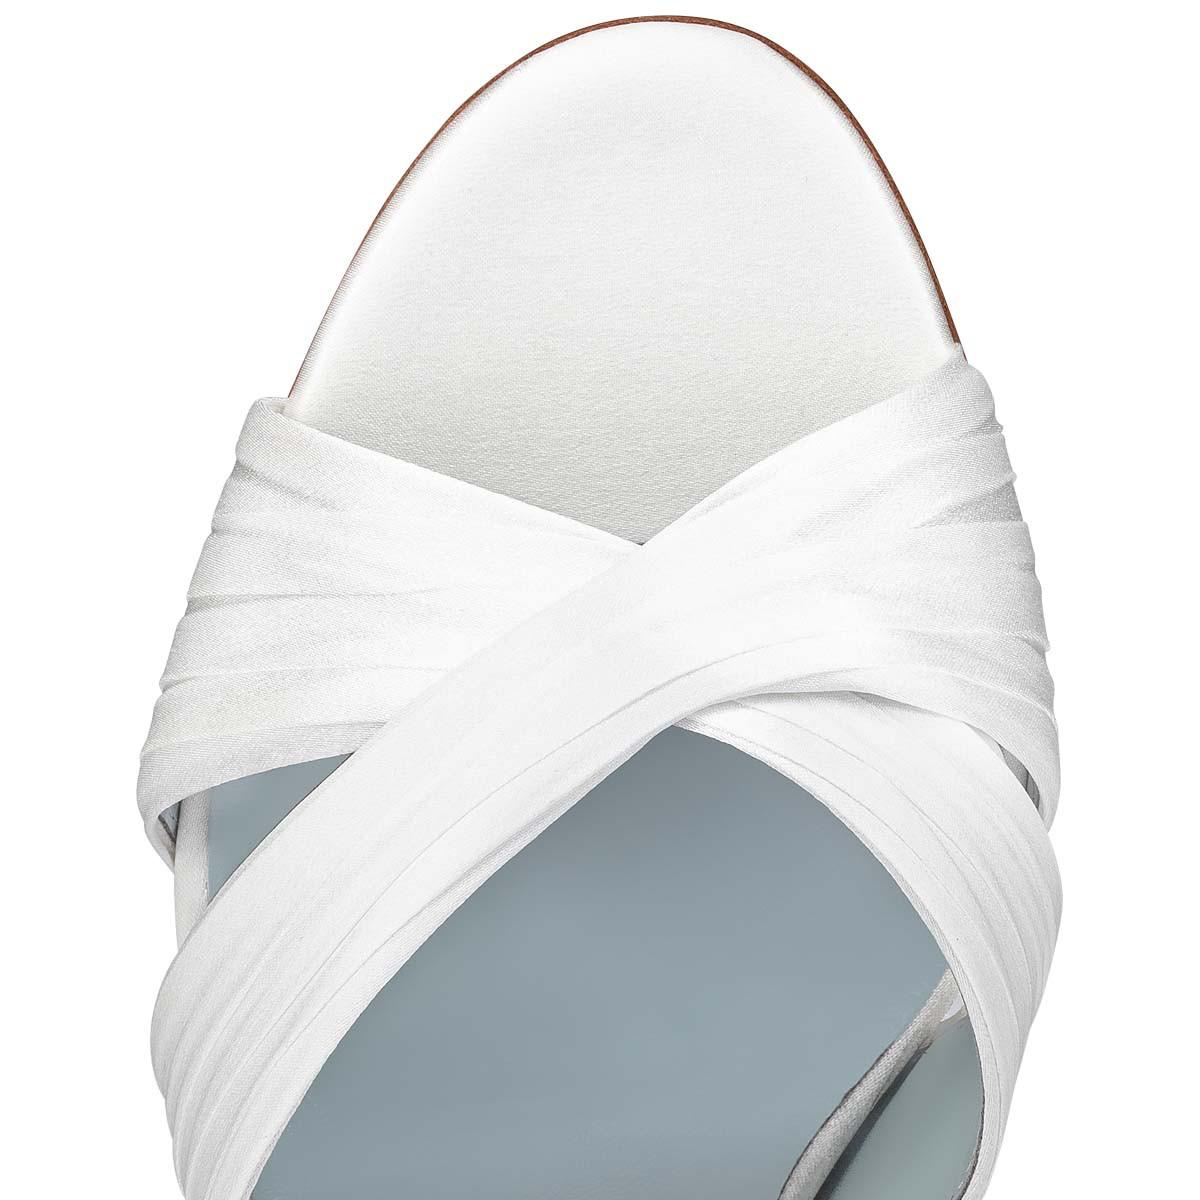 Shoes - Nicol Is Back - Christian Louboutin